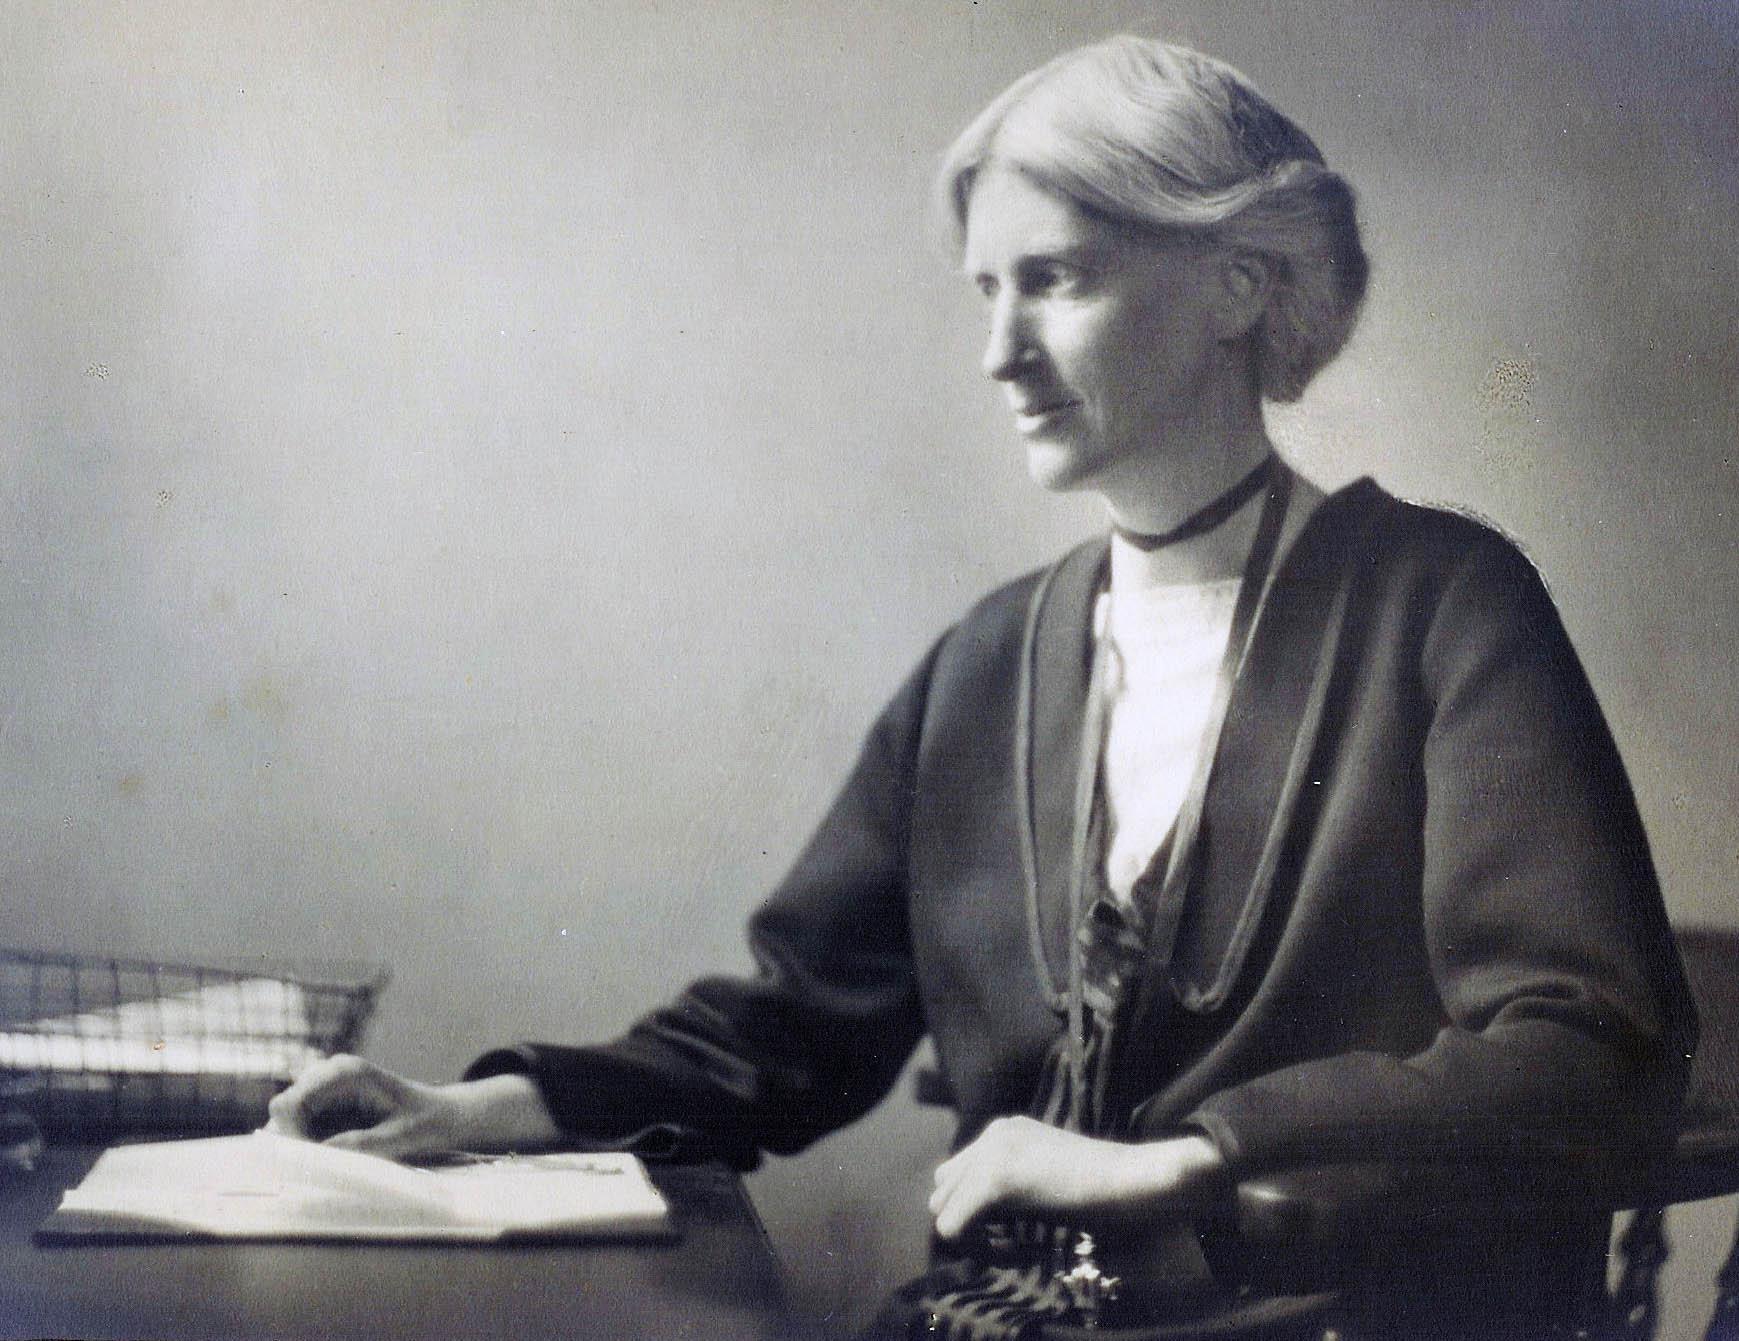 Eglantyne Jebb var den som grundade Rädda Barnen 1919  Eglantyne Jebb founded Save the Children in 1919